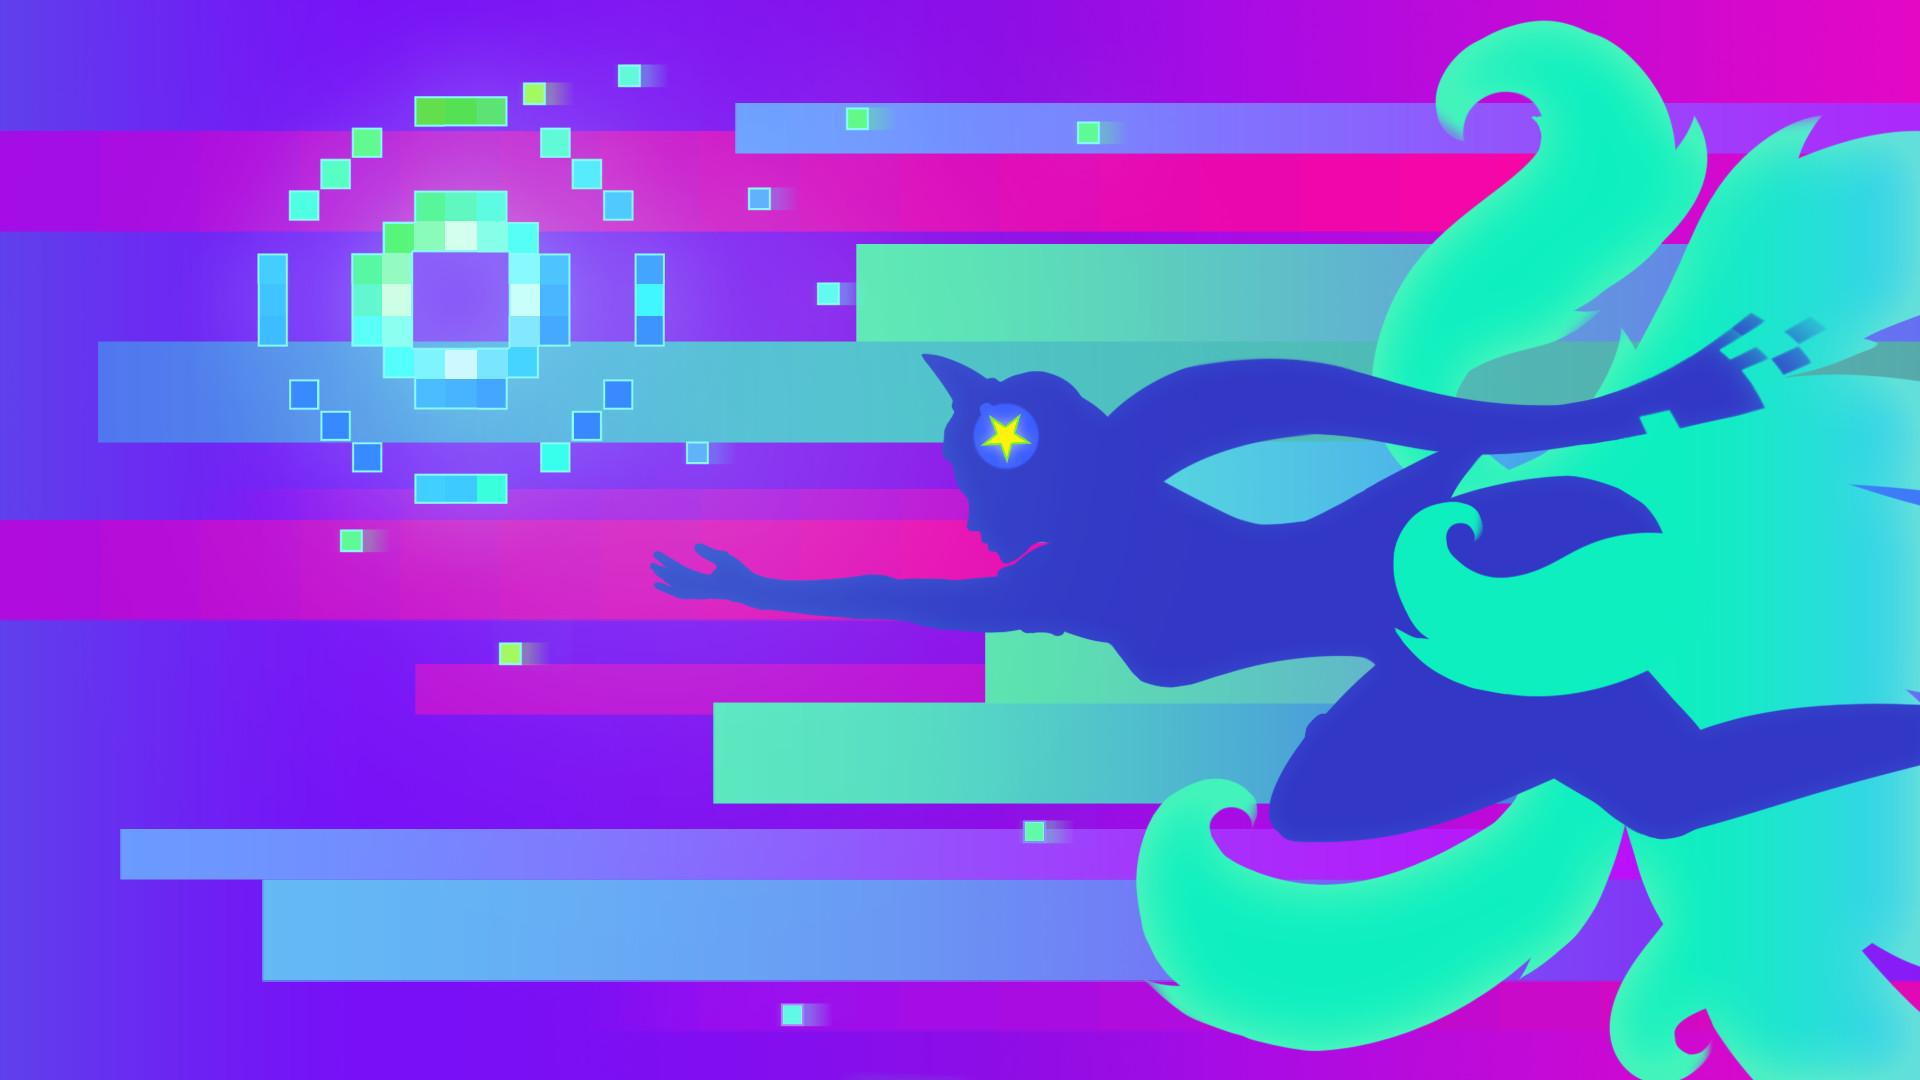 … Arcade Ahri wallpaper FullHD-Mobile-Wide-screen by Draxaca